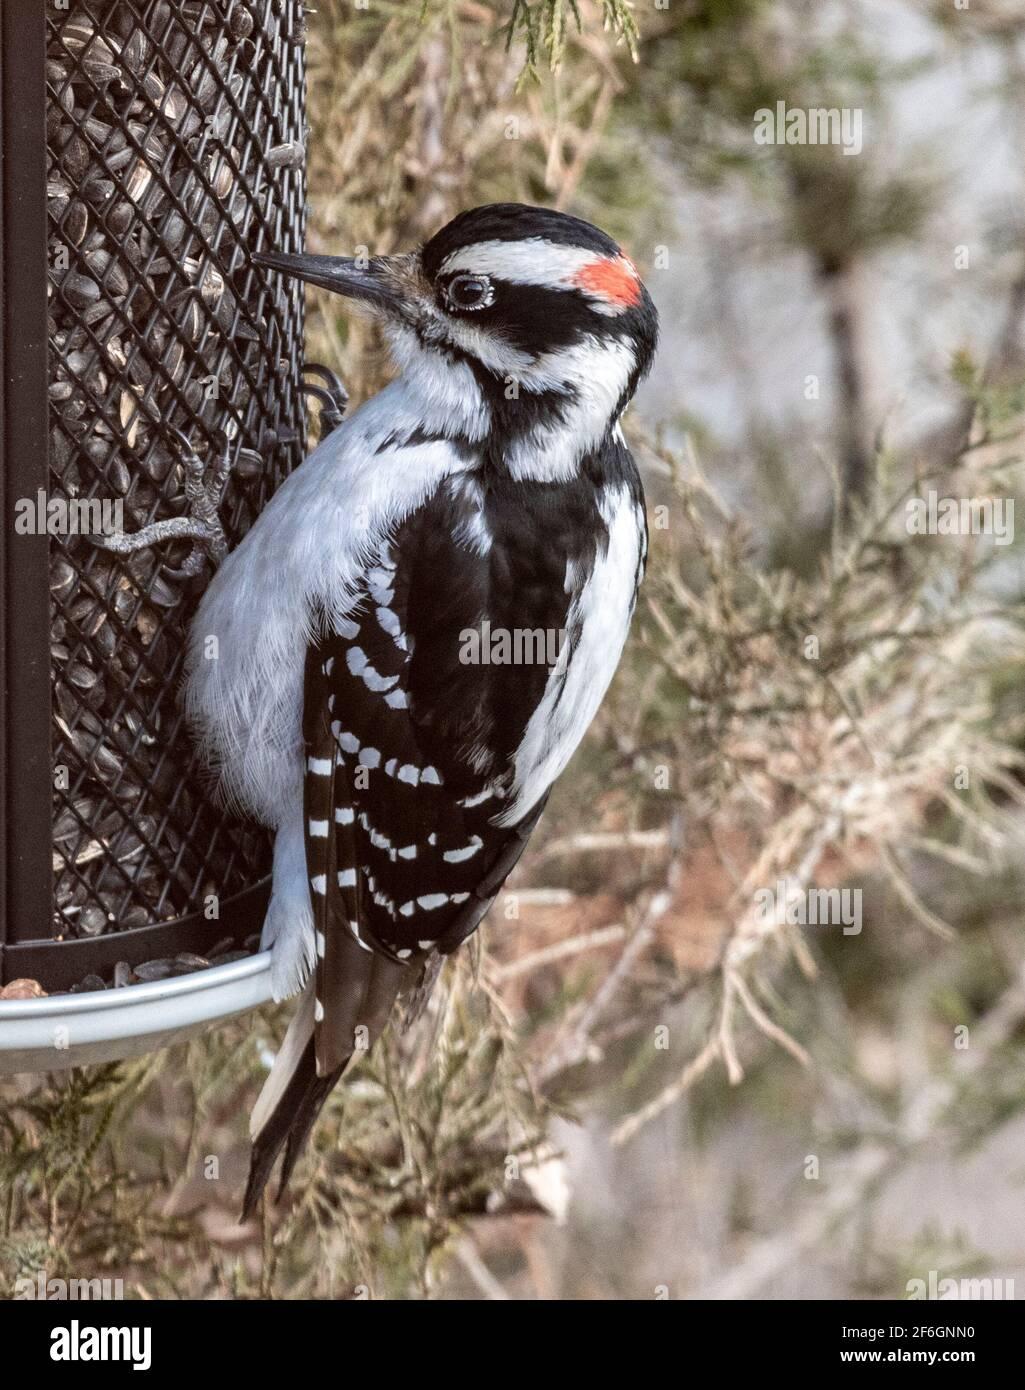 male-downy-woodpecker-on-bird-feeder-eating-sunflower-seeds-2F6GNN0.jpg